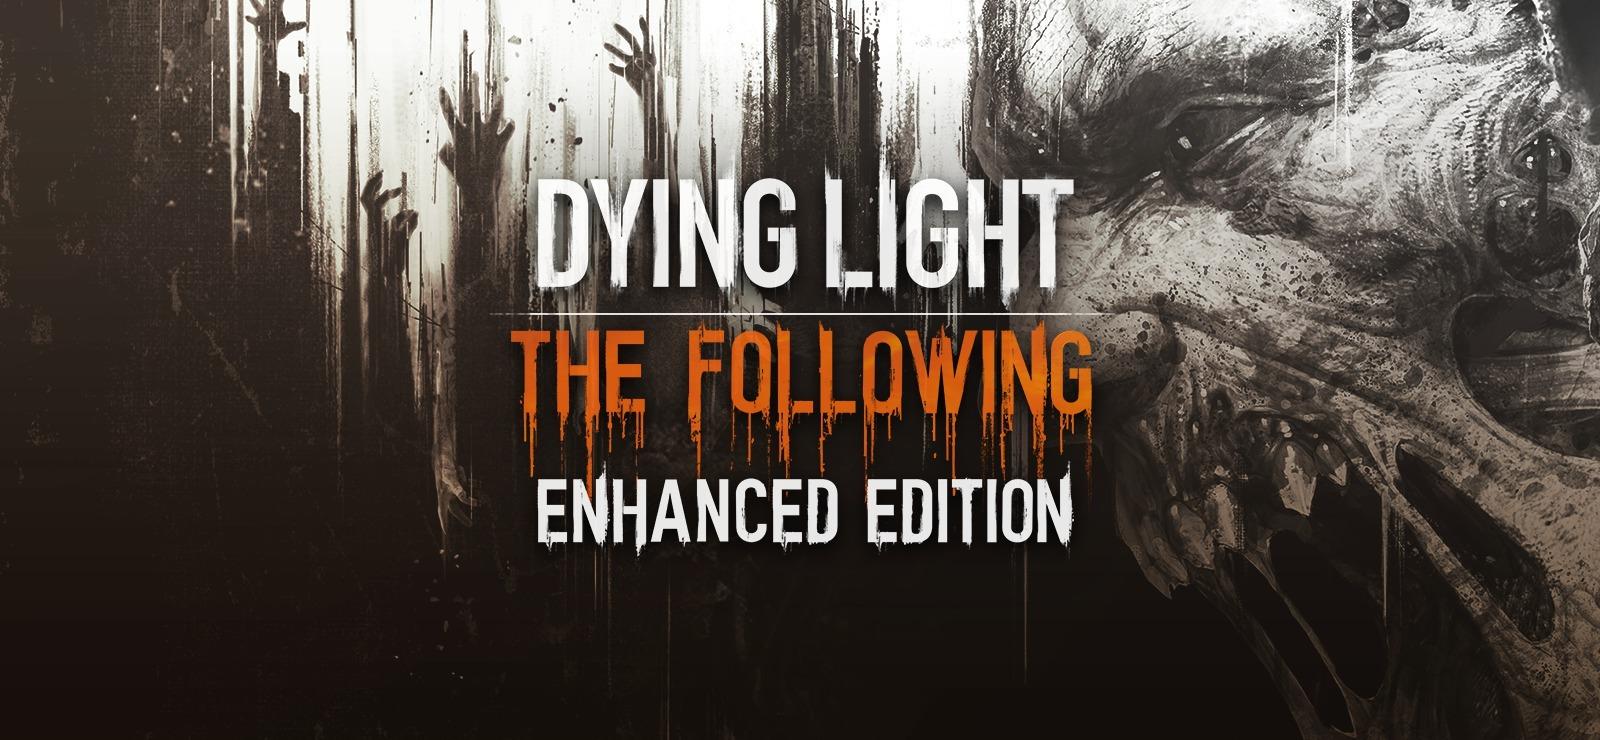 Dying Light: The Following Enhanced Edition Steam Key | Region Free | Multi